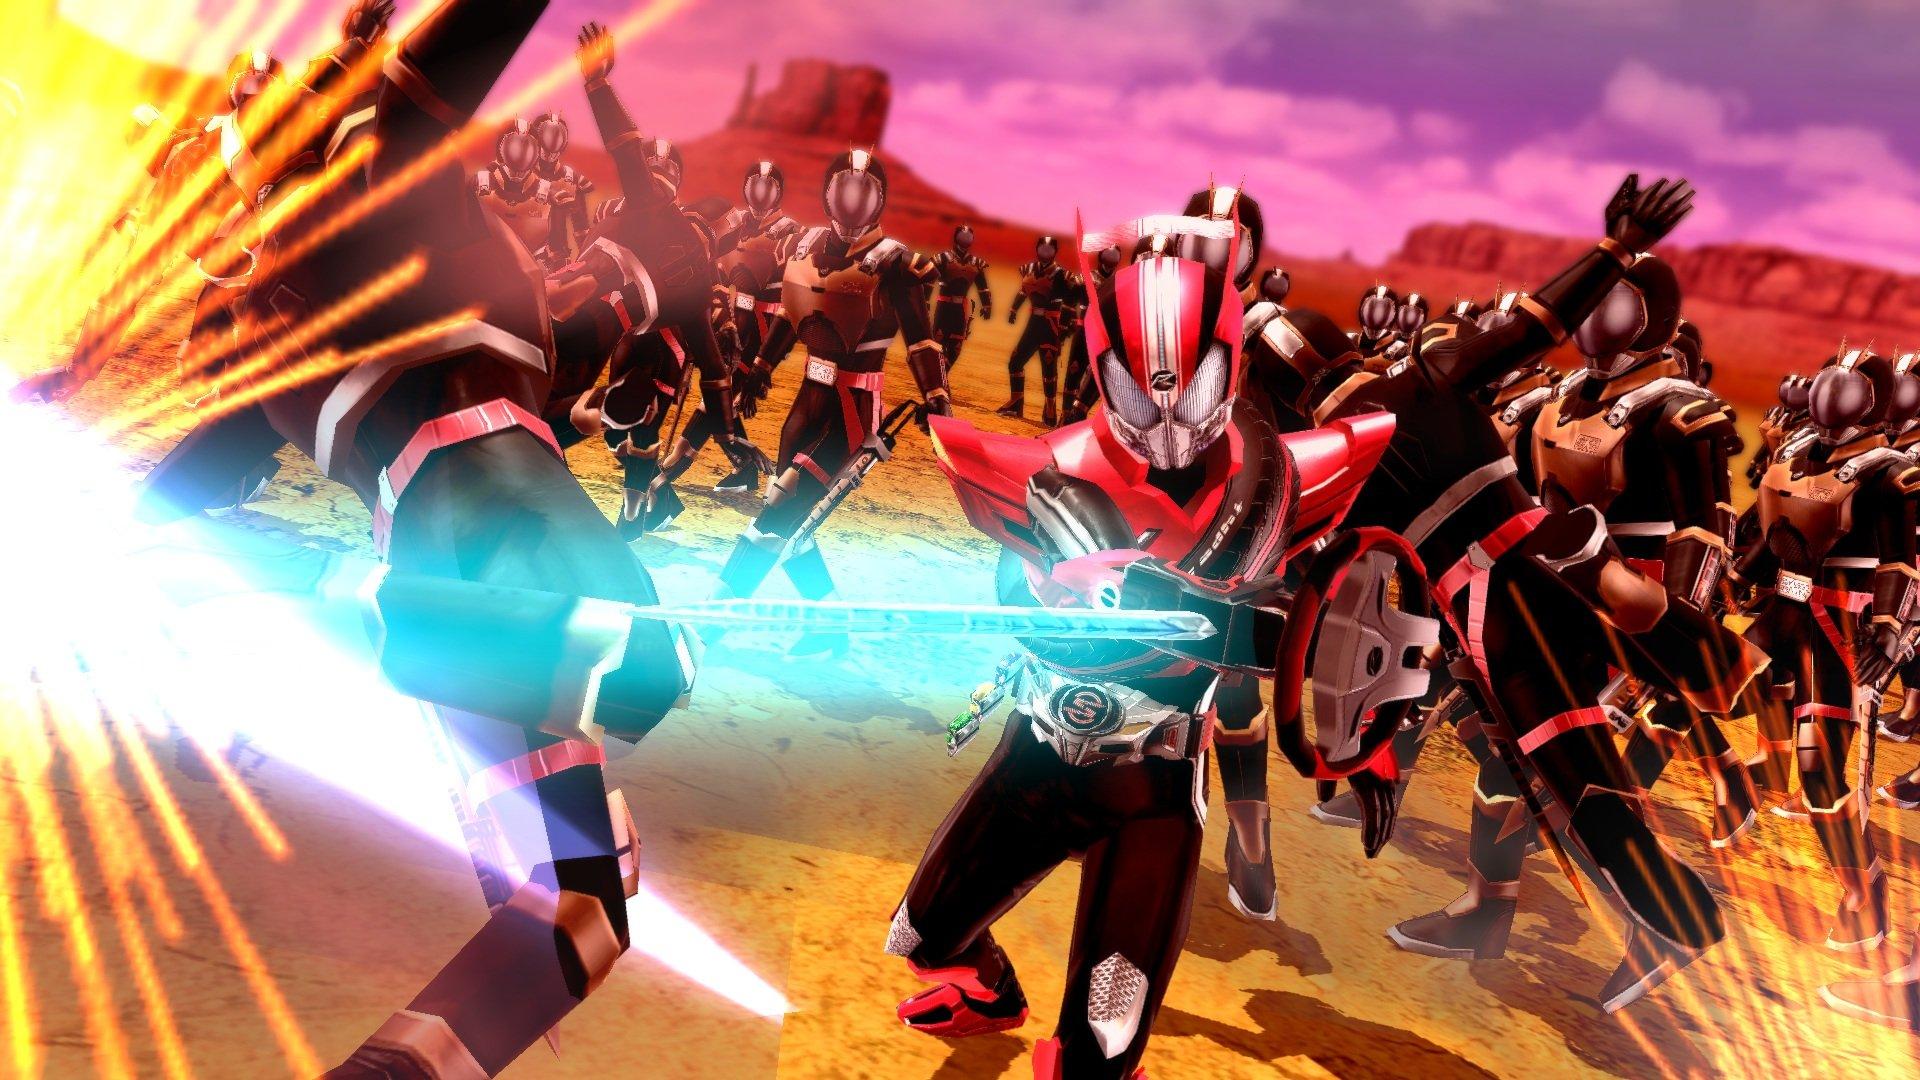 Kamen Rider: Battride War Creation Japanese Ver. (Limited edition) by Bandai (Image #8)